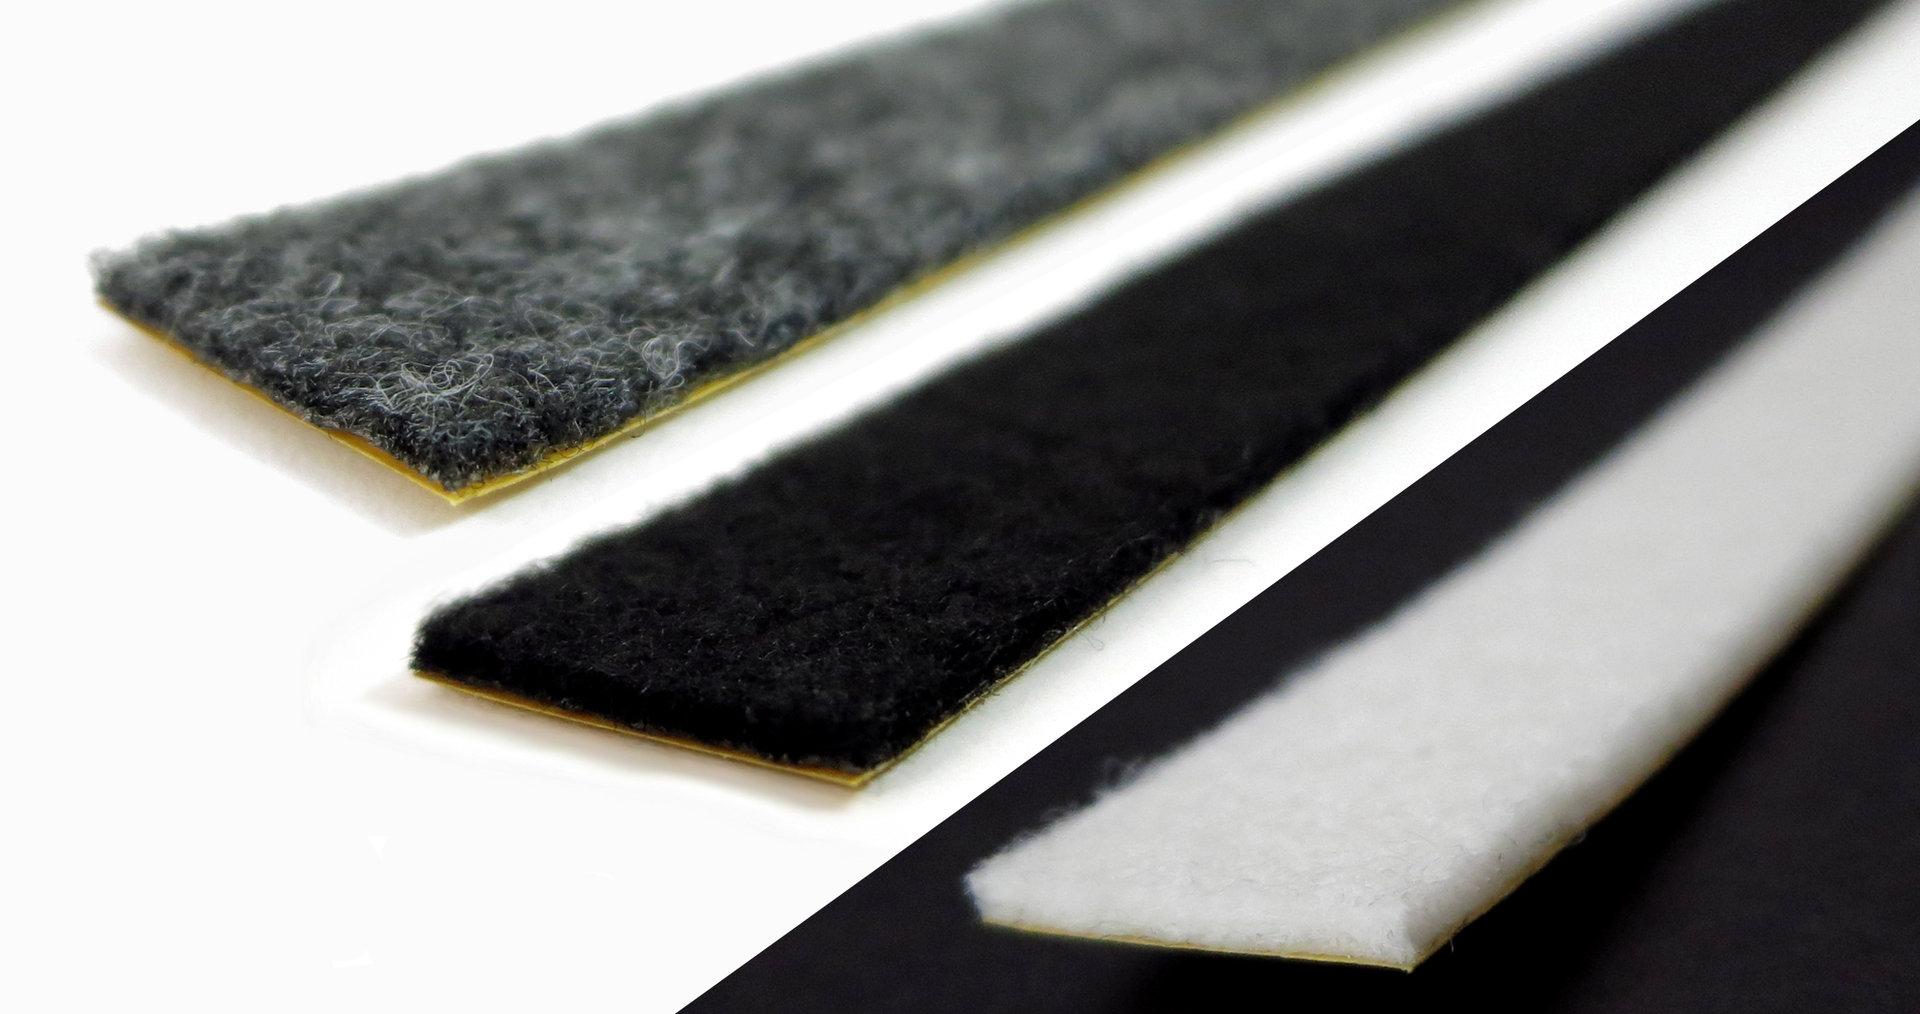 filzstreifen filzband meterware stark selbstklebend 2mm dick. Black Bedroom Furniture Sets. Home Design Ideas